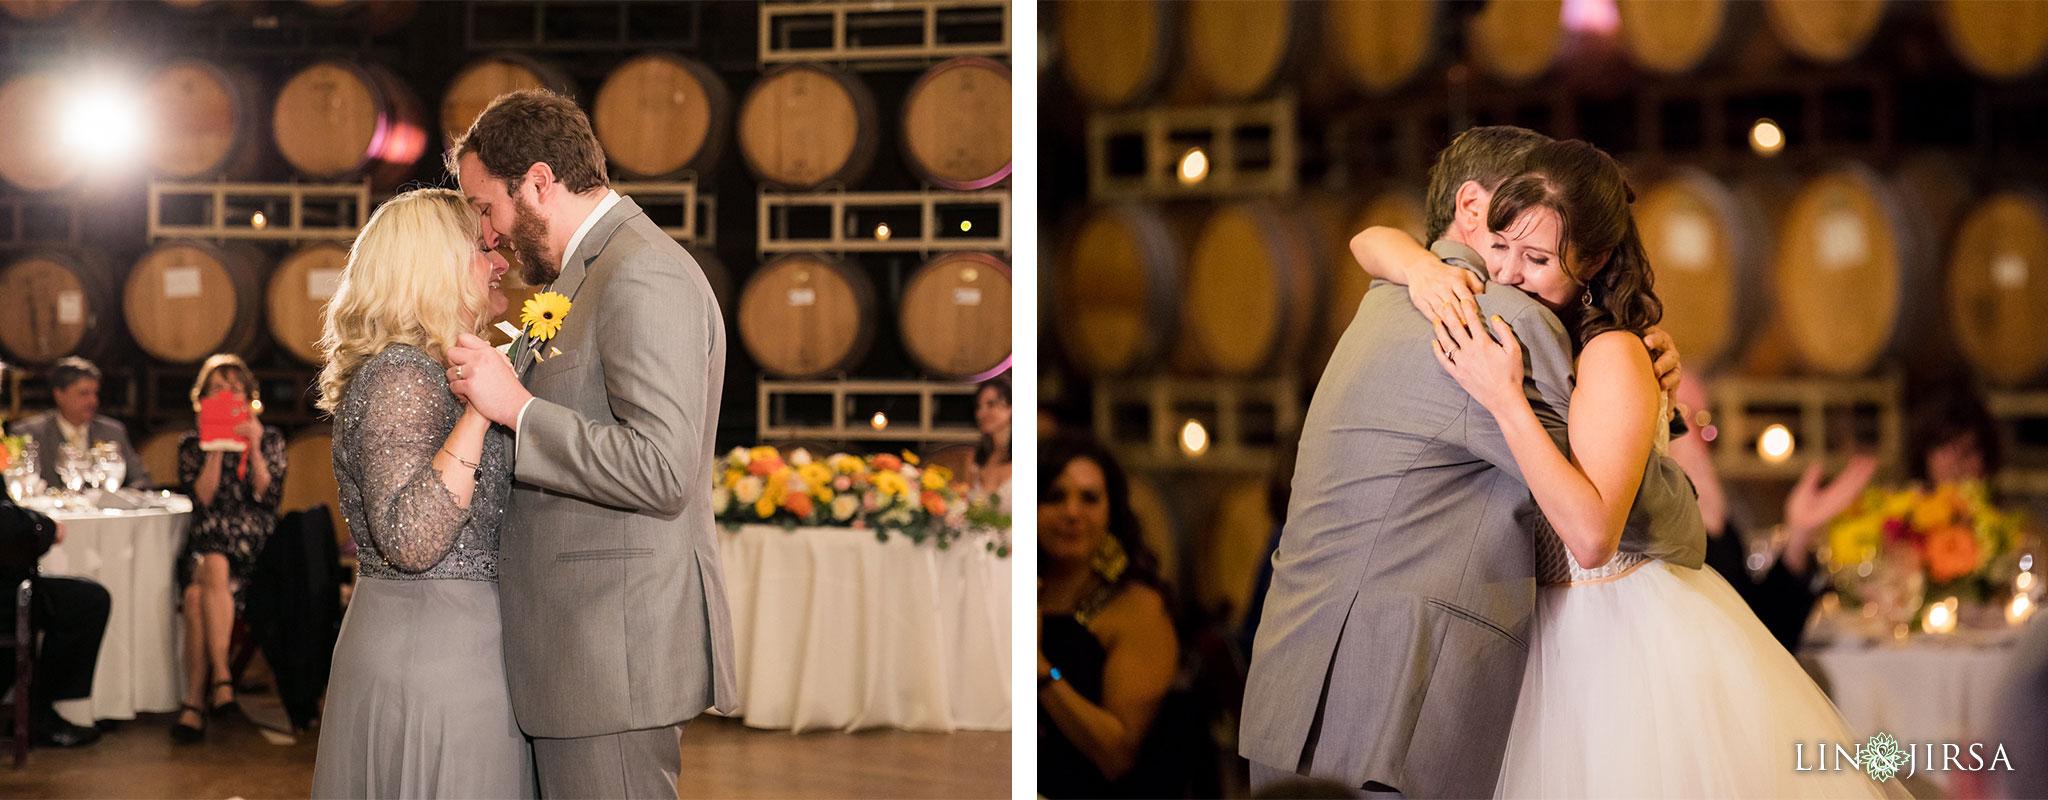 35 leoness cellars temecula wedding reception photography